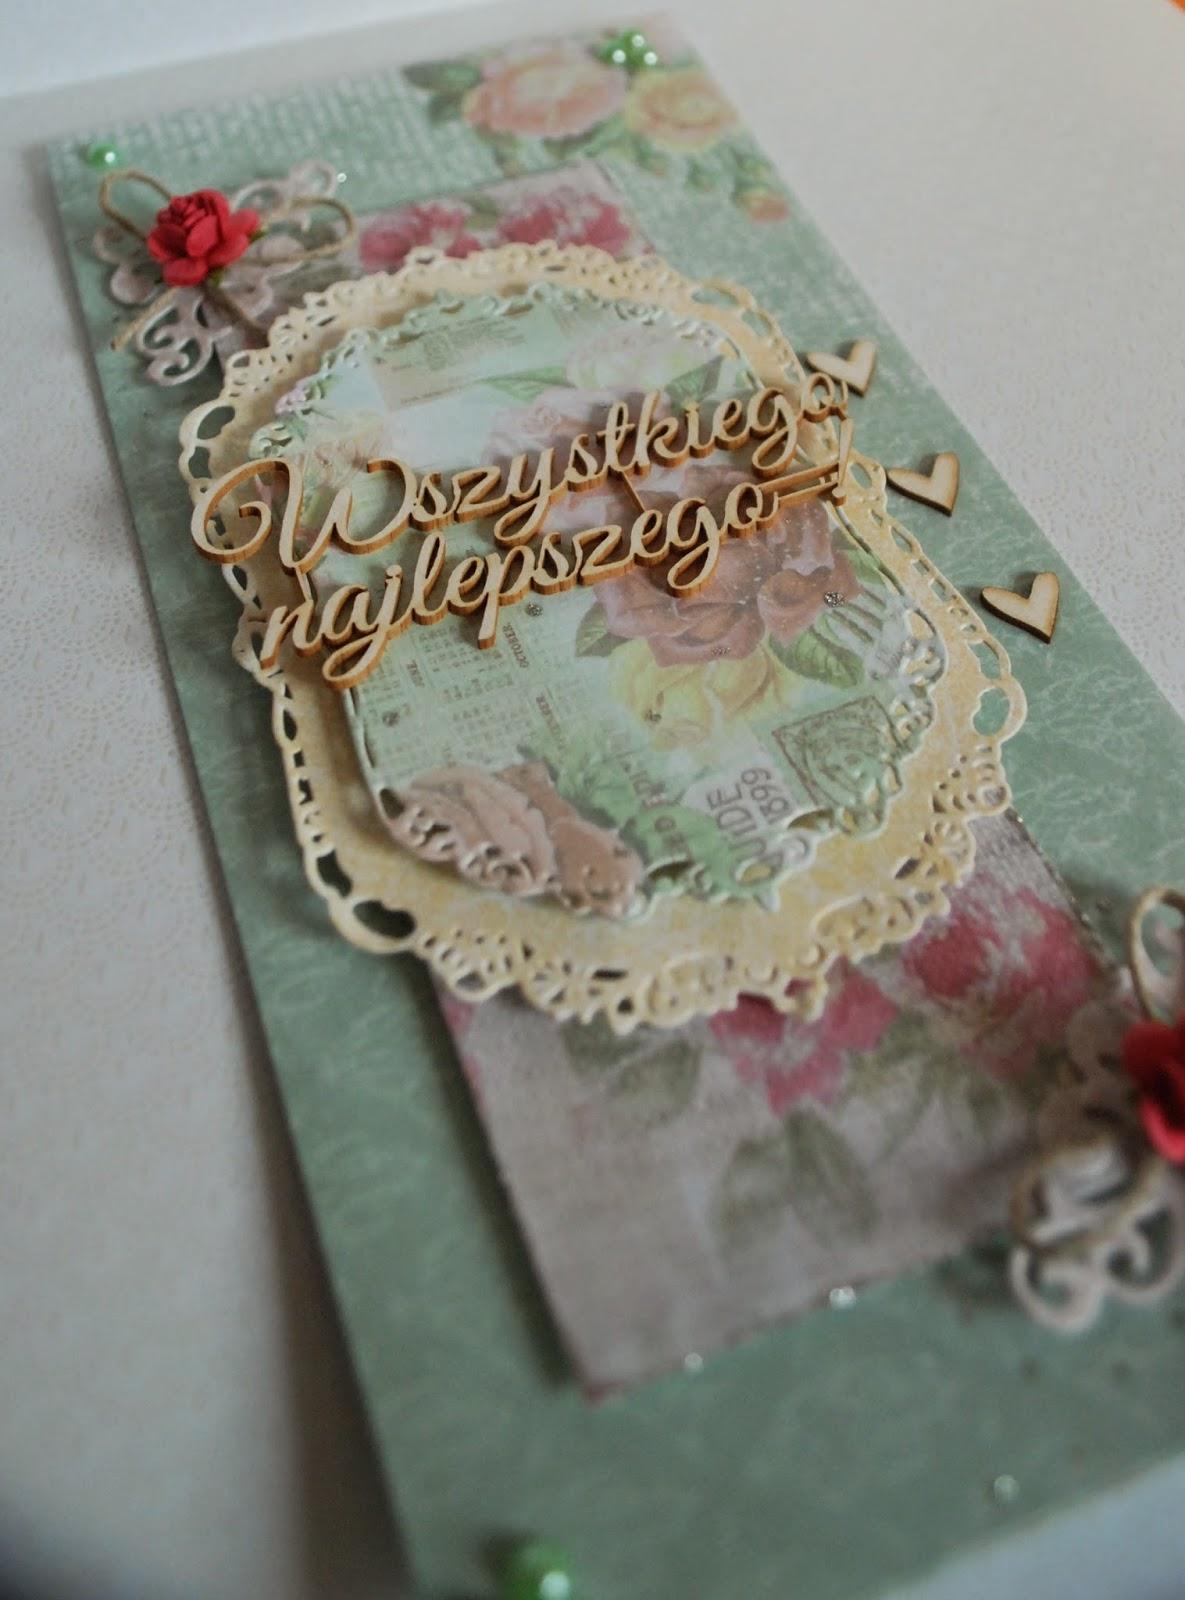 kartka urodziny, pastele, delikatne kolory